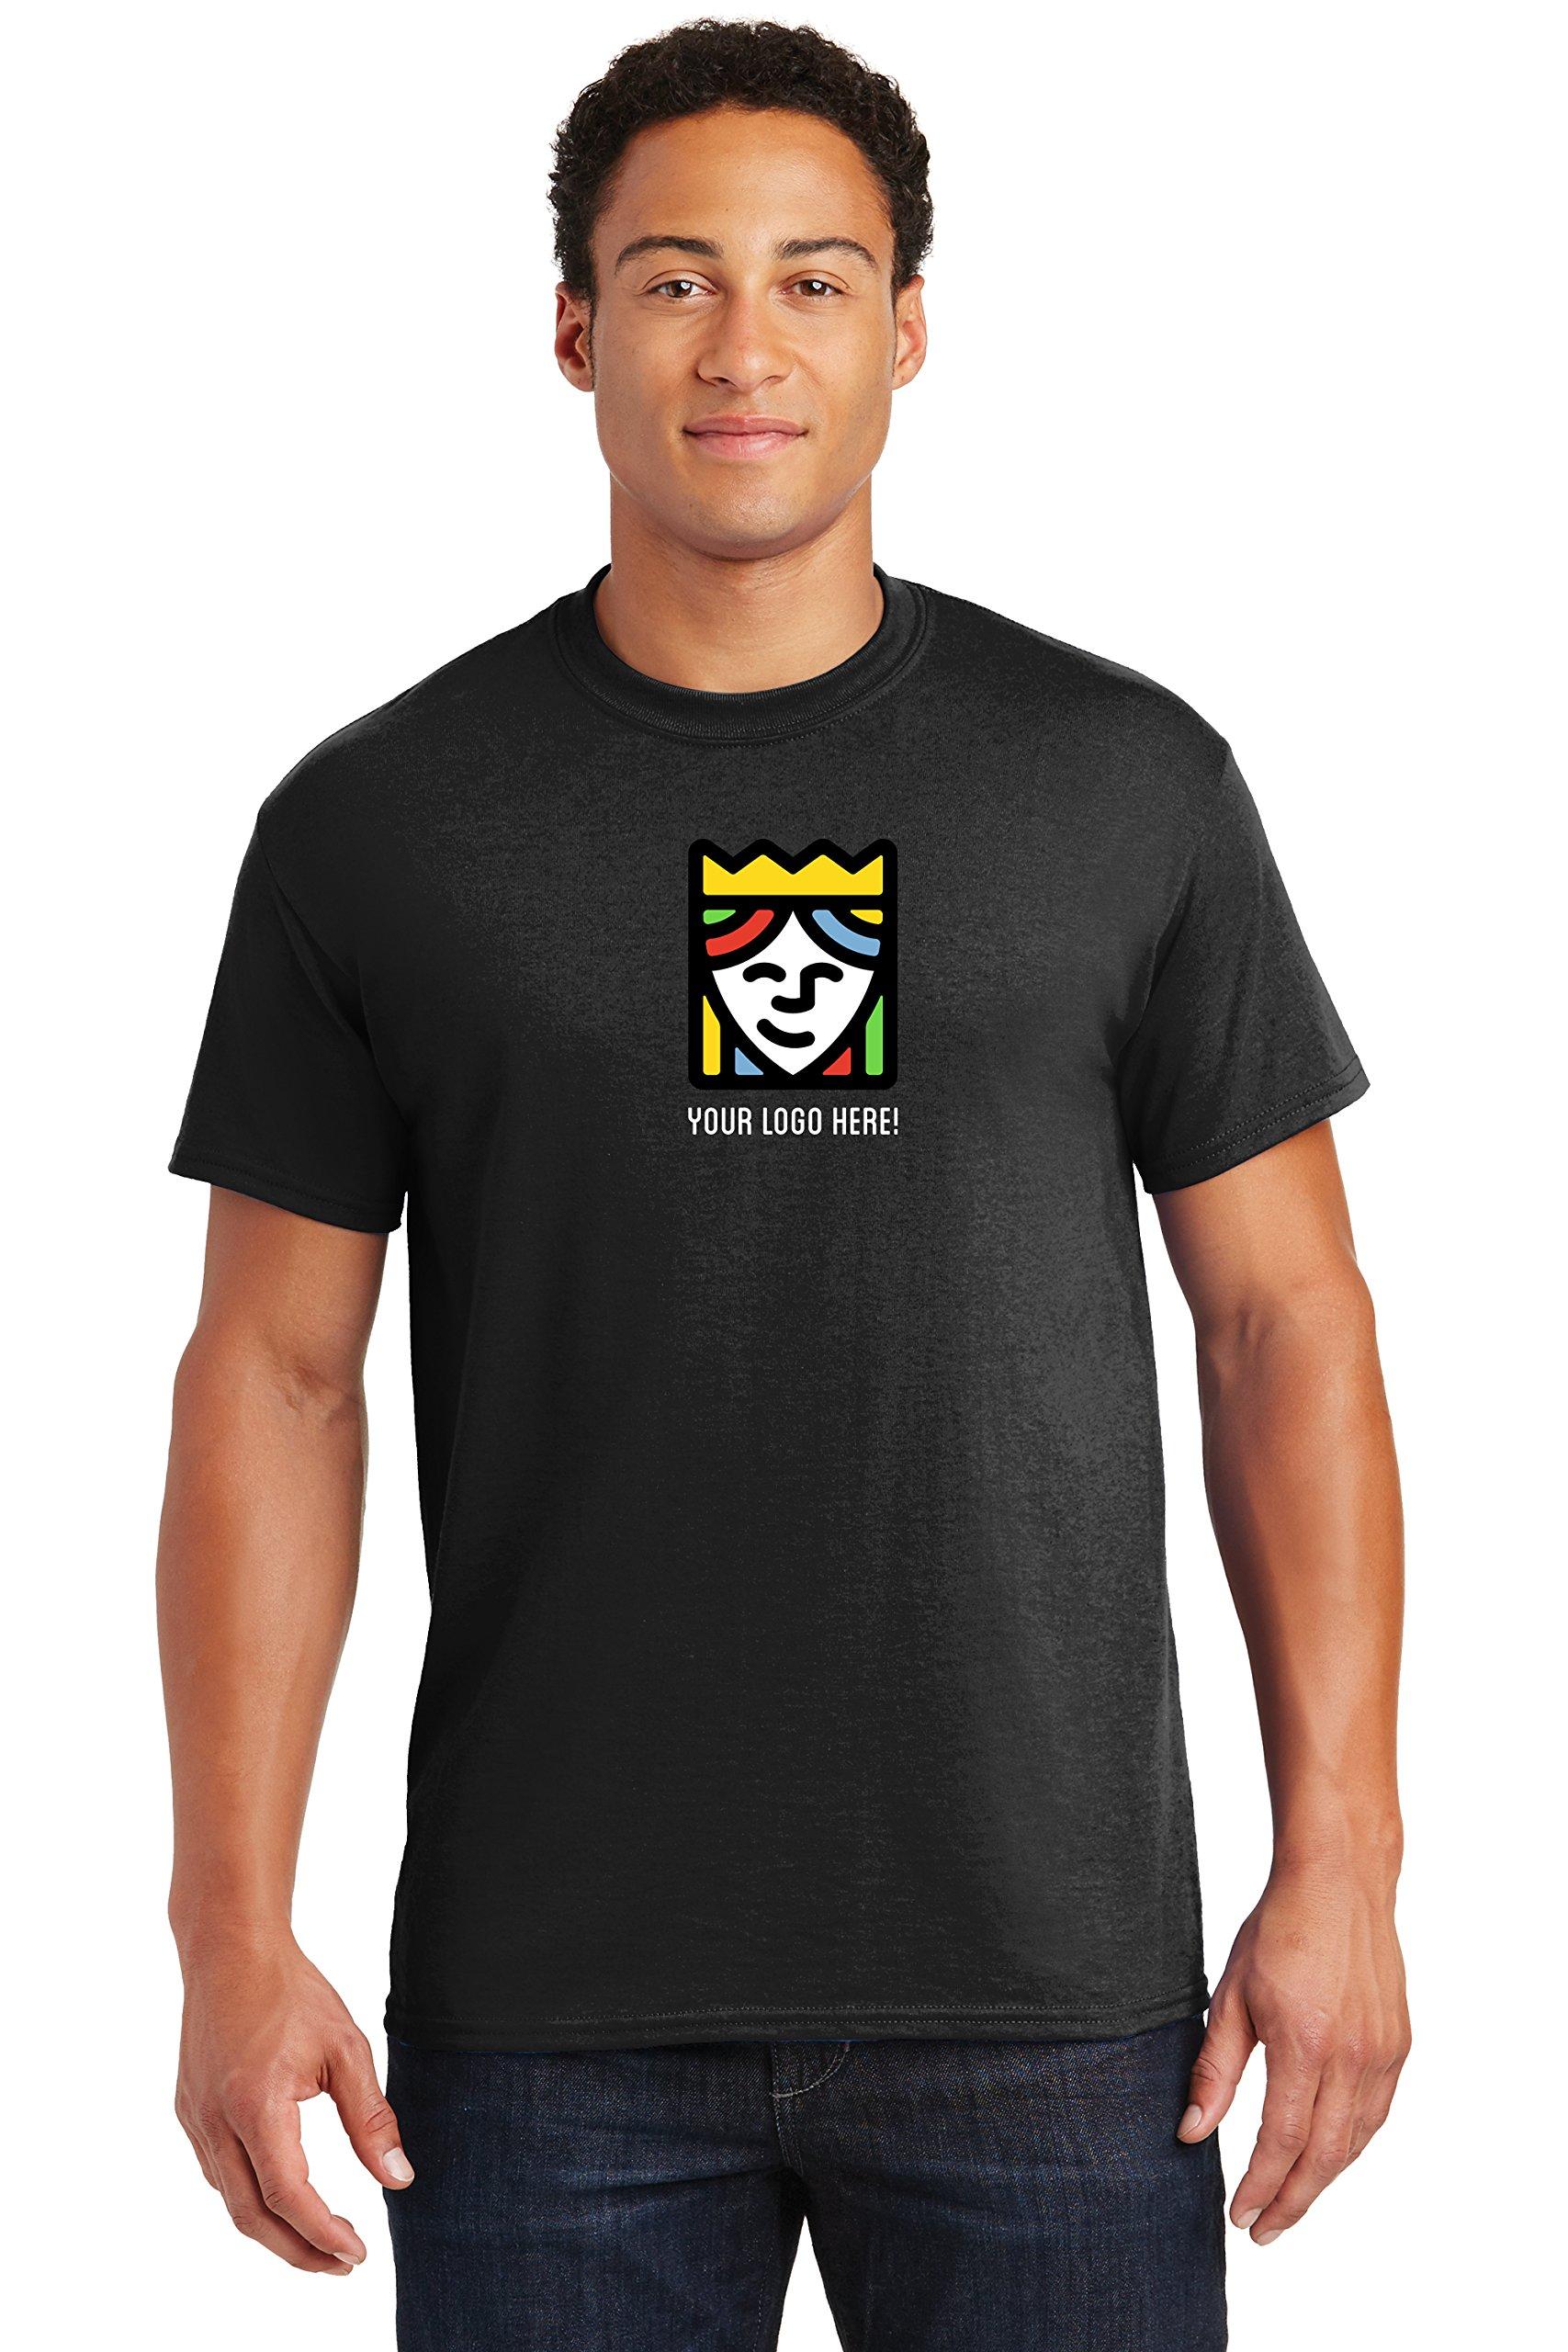 Queensboro Shirt Company Custom Printed Gildan DryBlend T-Shirts – Pack Of 25 by Queensboro Shirt Company